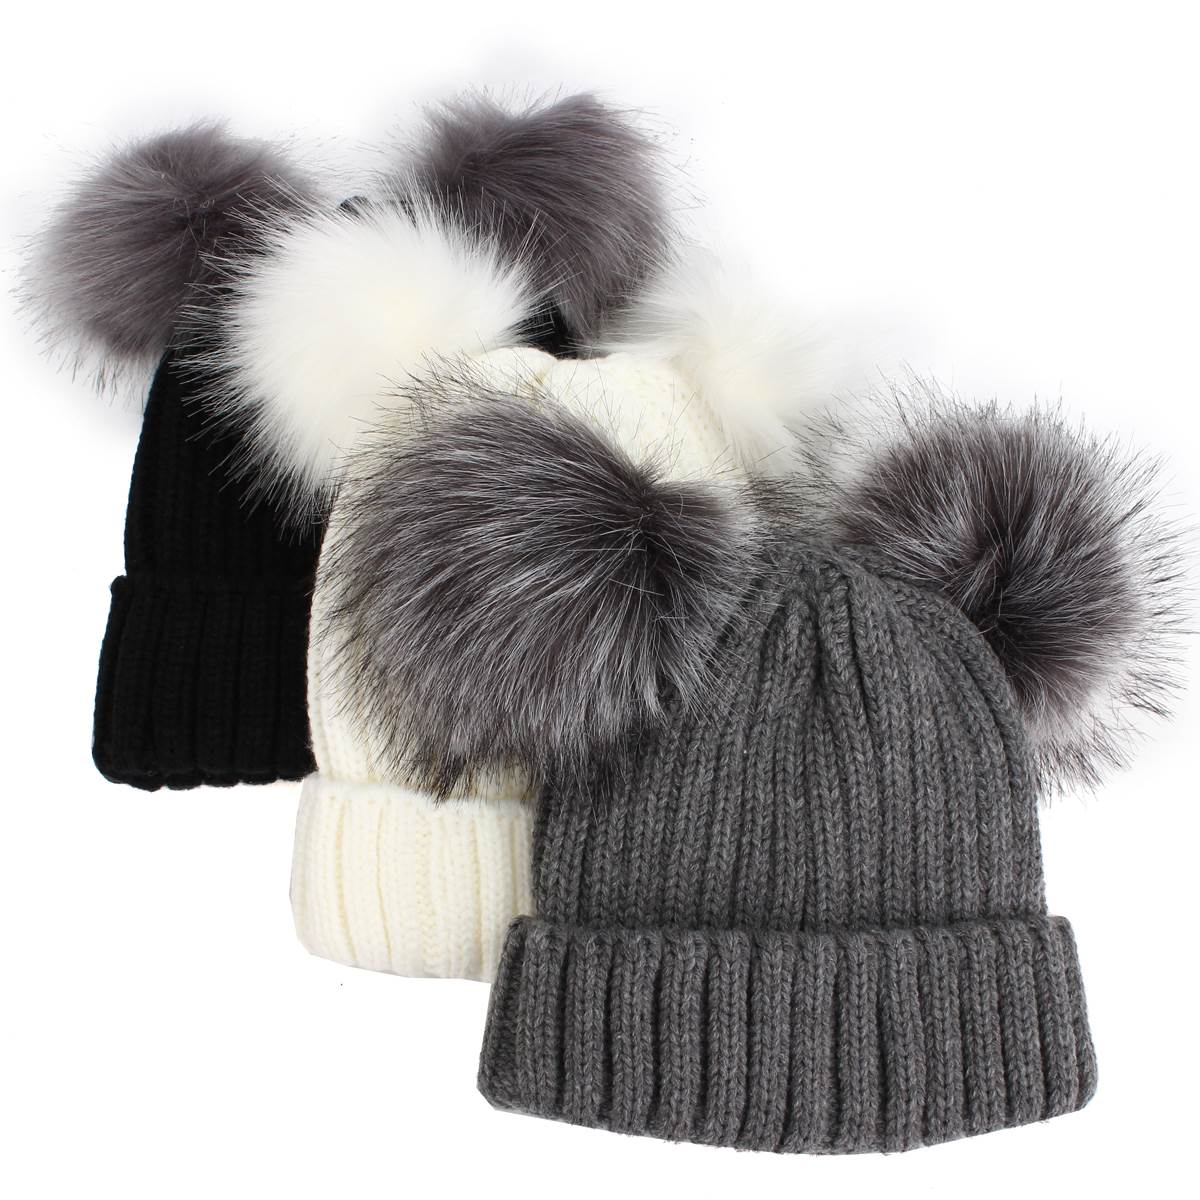 82cbc362 Furry Hat With Double Pompom Women Winter Warm Knitted Wool Cotton Hats  Bobble Gorros Beanies Bonnet Ear Warmer Female Ski Cap-in Skullies &  Beanies from ...